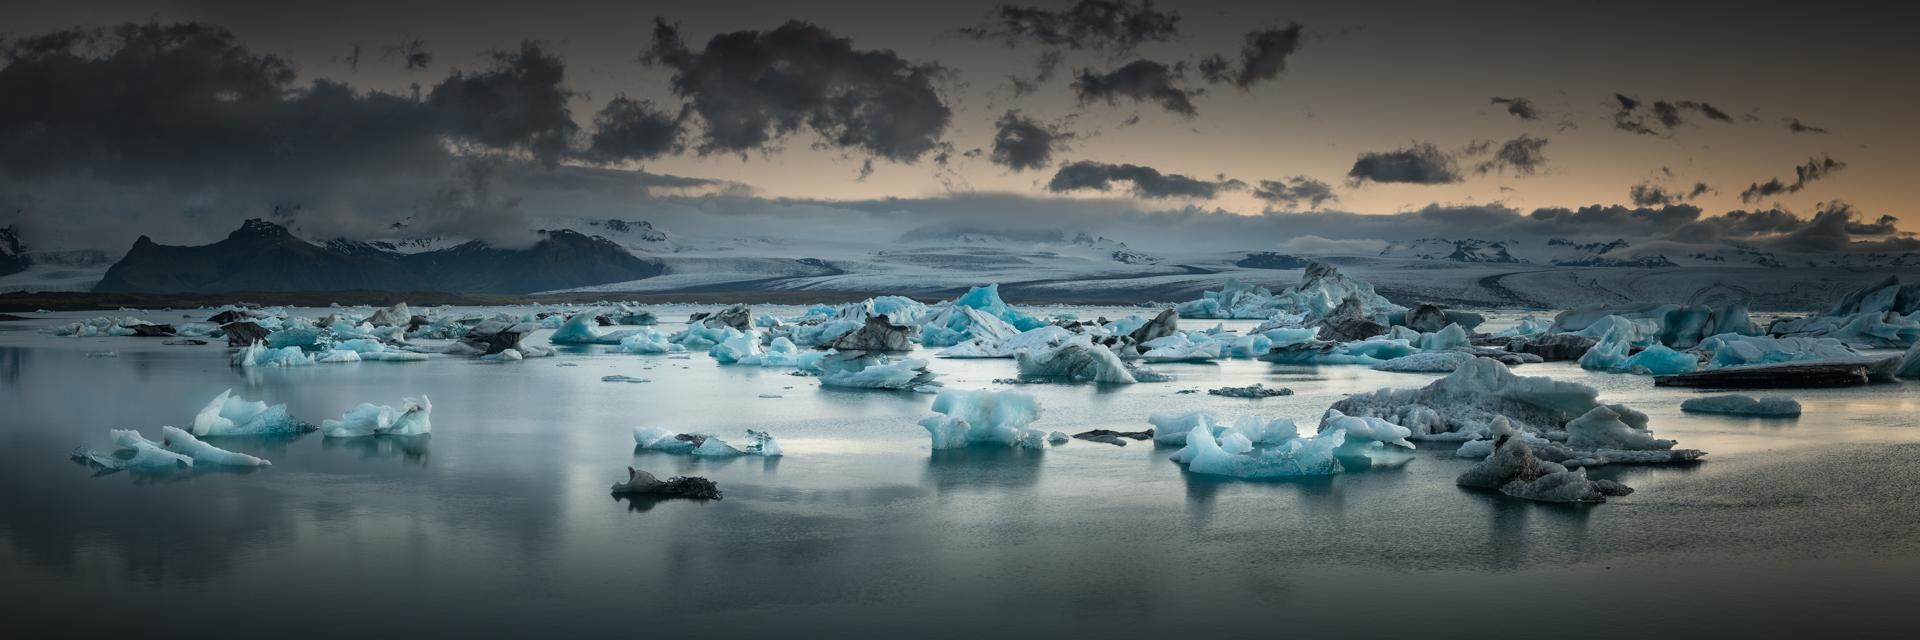 Iceberg_3b.jpg